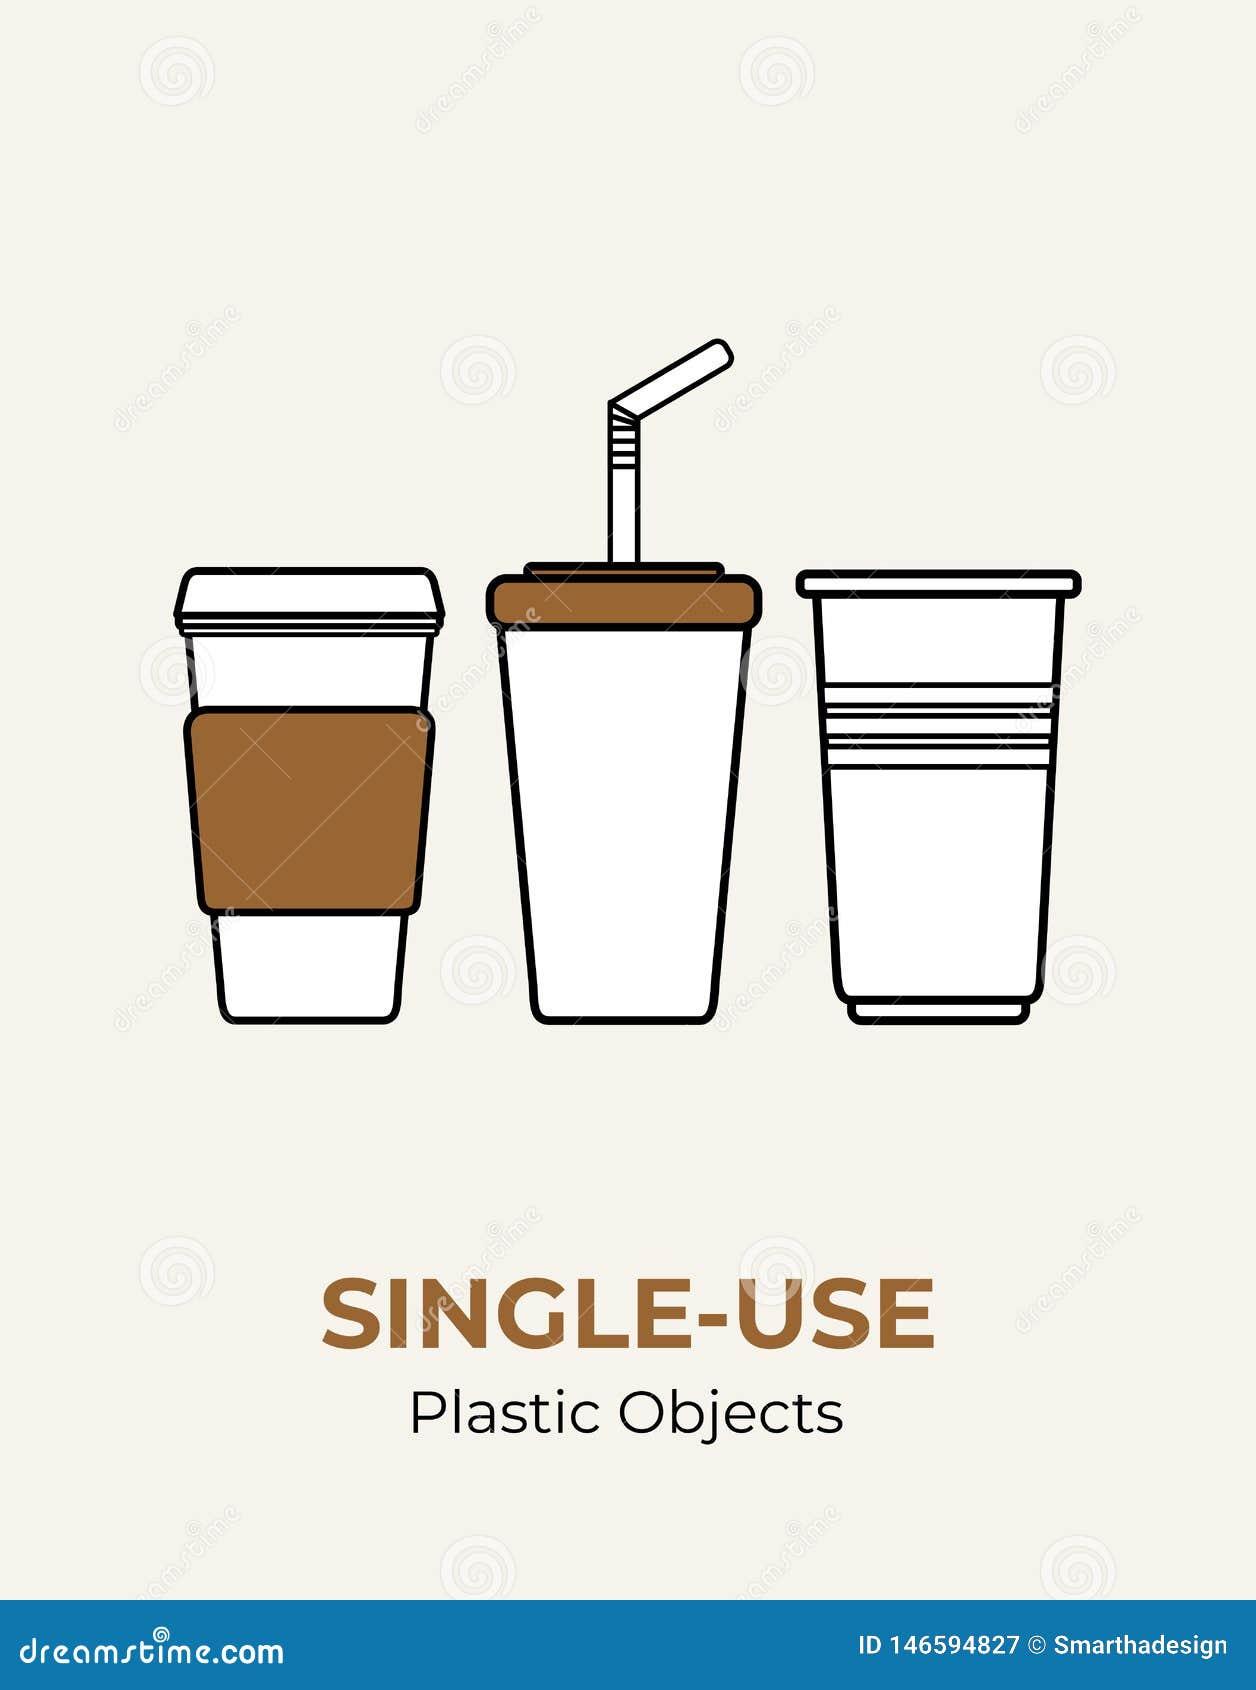 Taza de papel con la tapa pl?stica, paja, taza pl?stica Sistema pl?stico blanco no reutilizable del ejemplo del vector de los ute